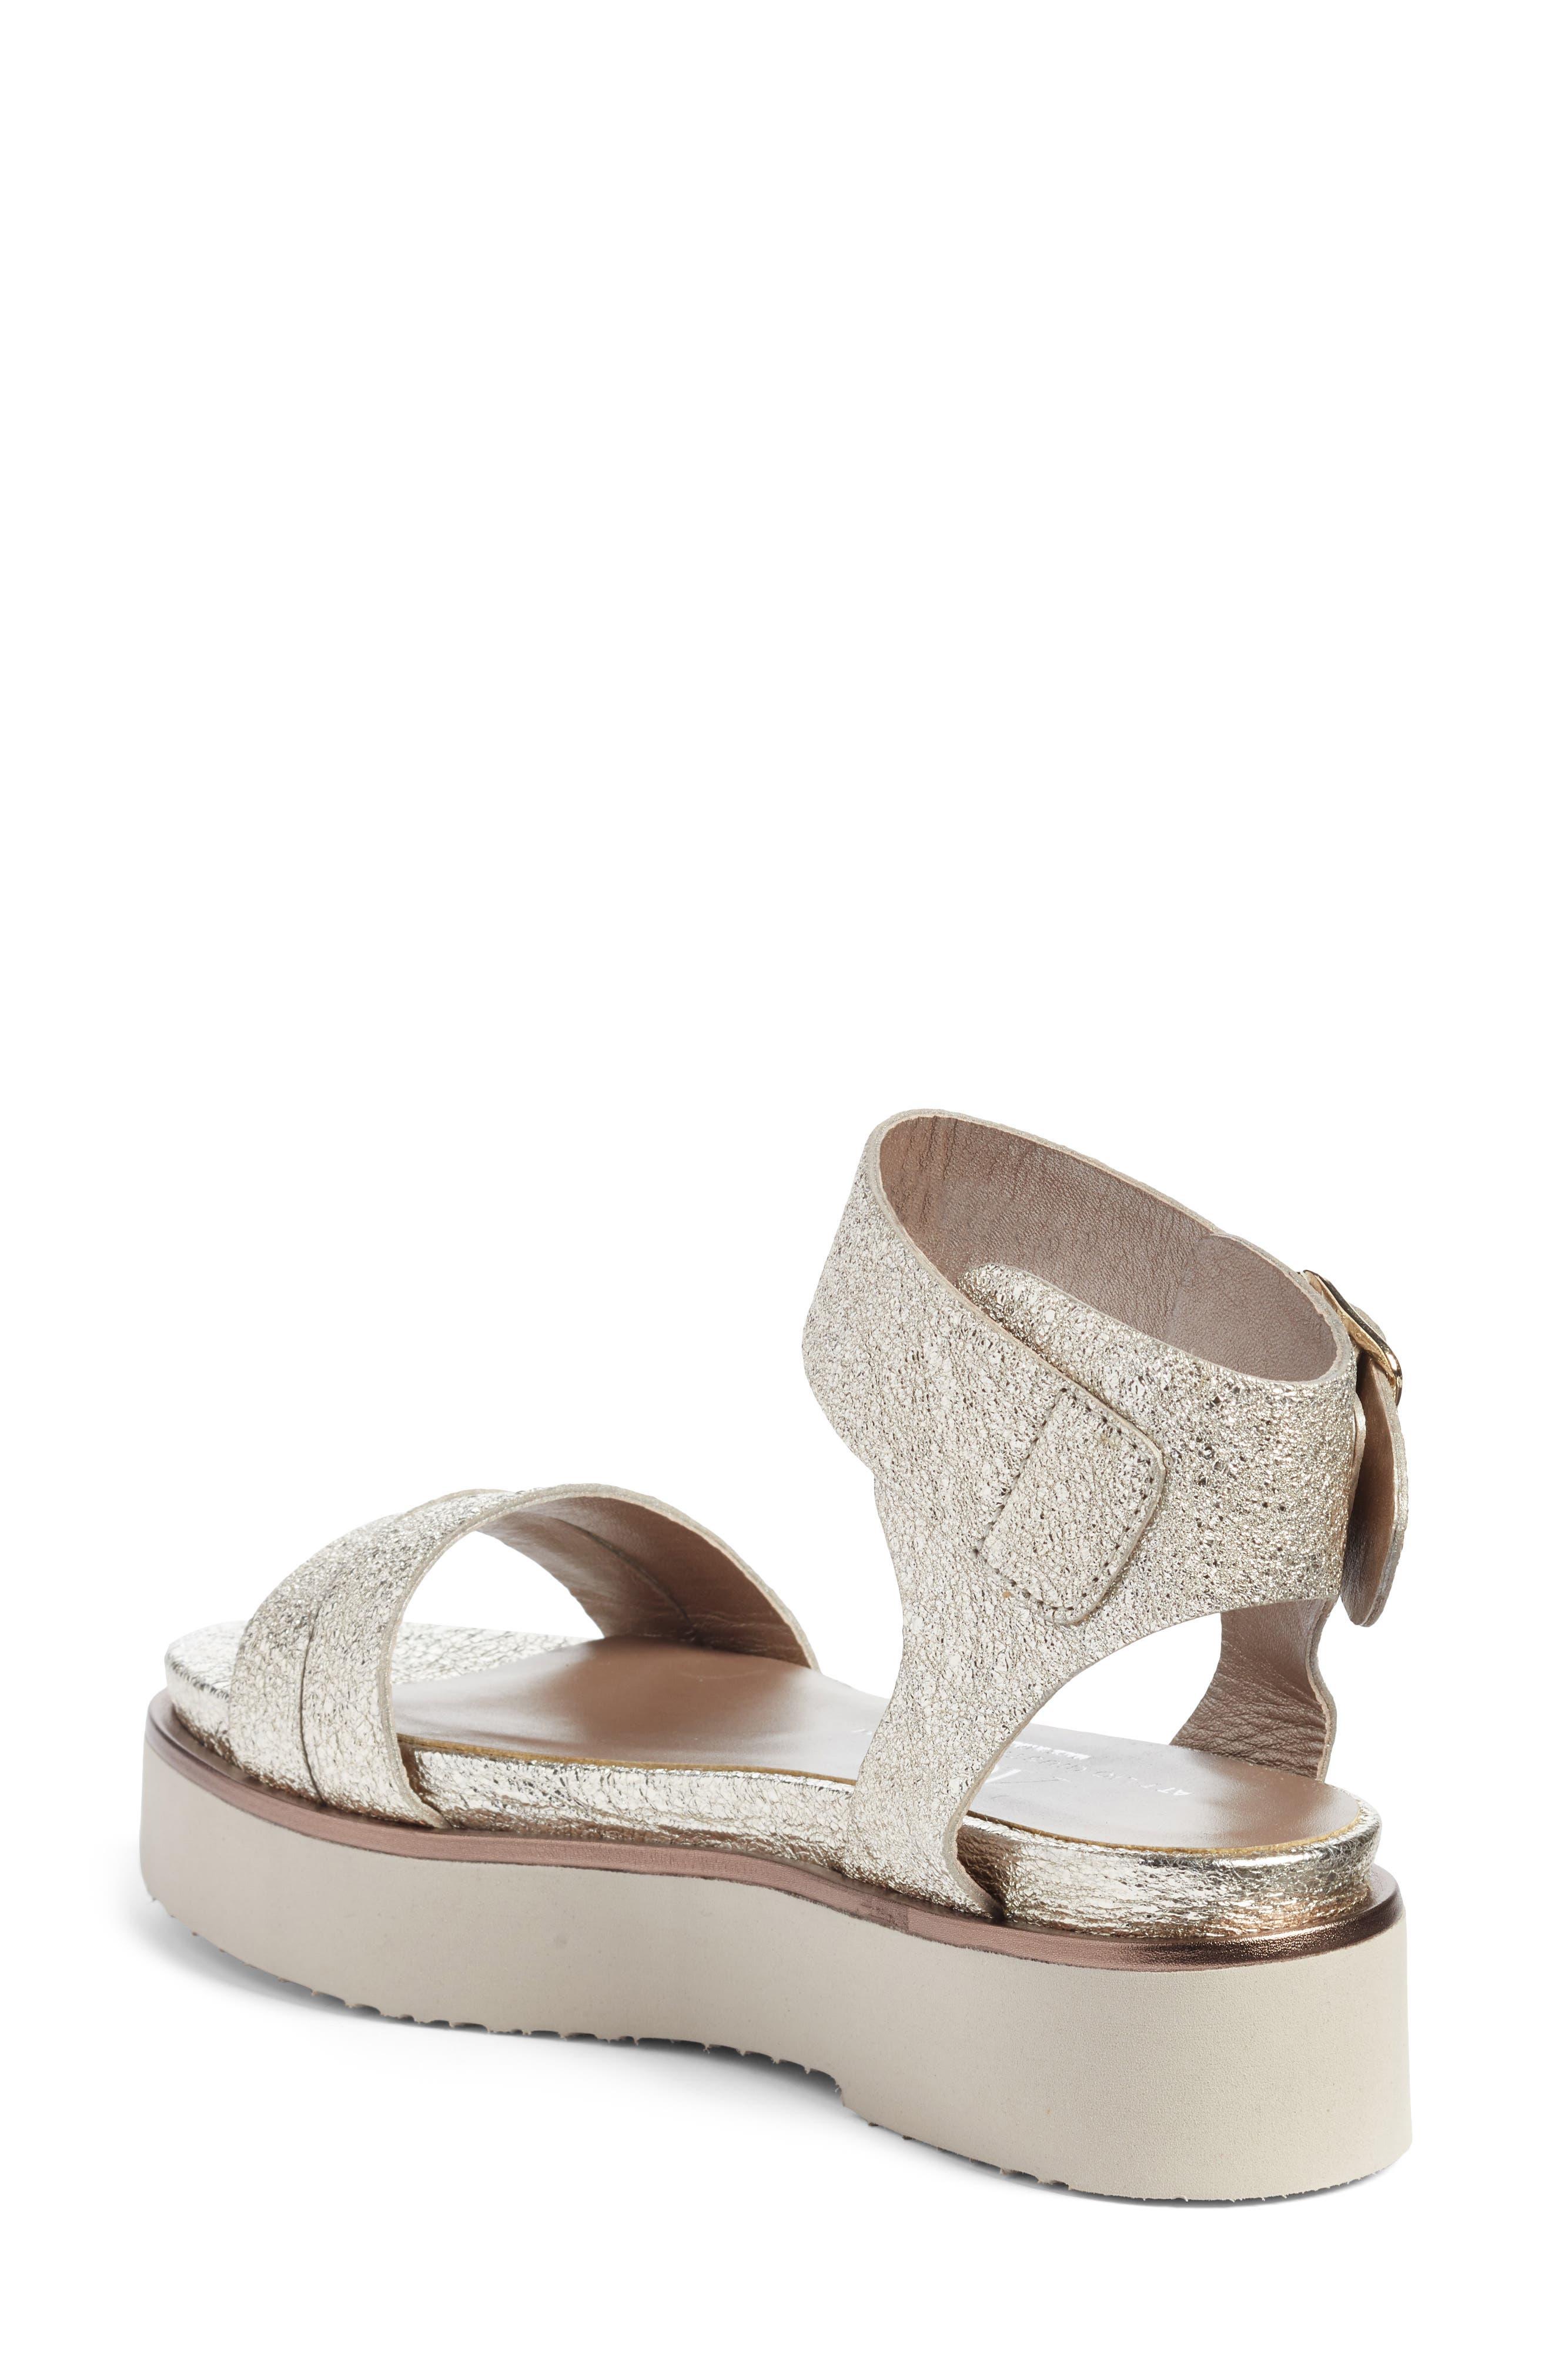 Ankle Strap Sandal,                             Alternate thumbnail 2, color,                             Golden Leather